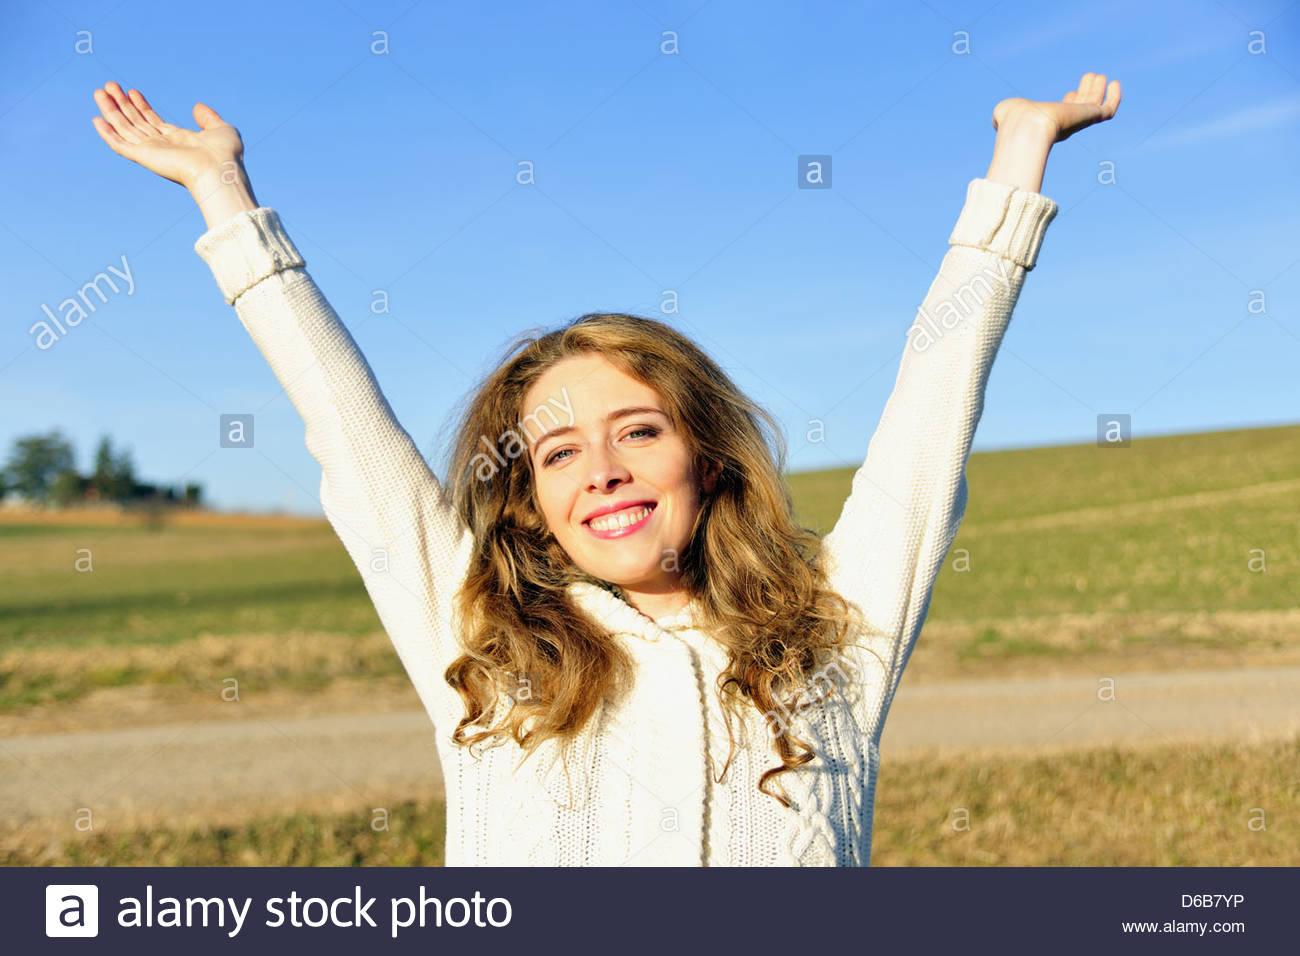 Woman cheering in rural field - Stock Image